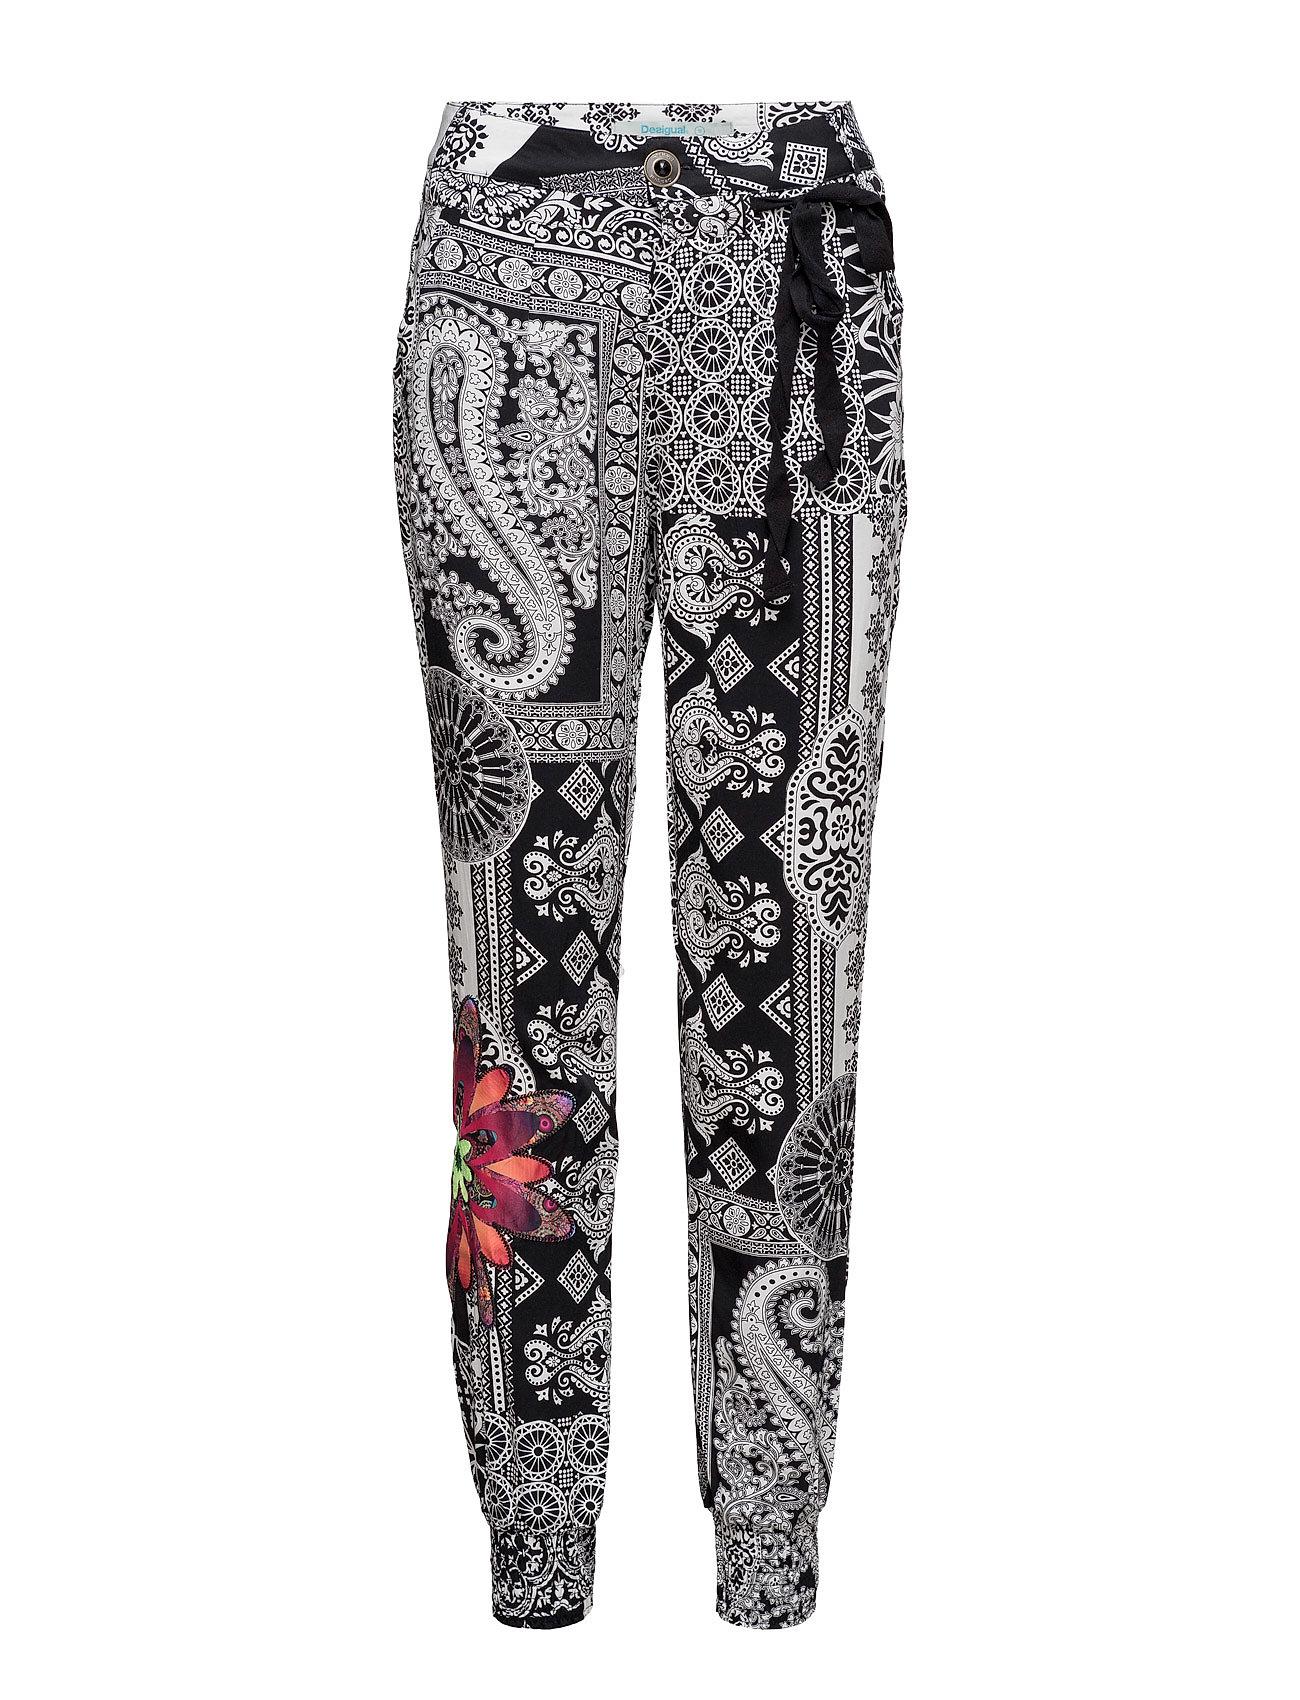 Pant Olass Desigual Casual bukser til Damer i neger